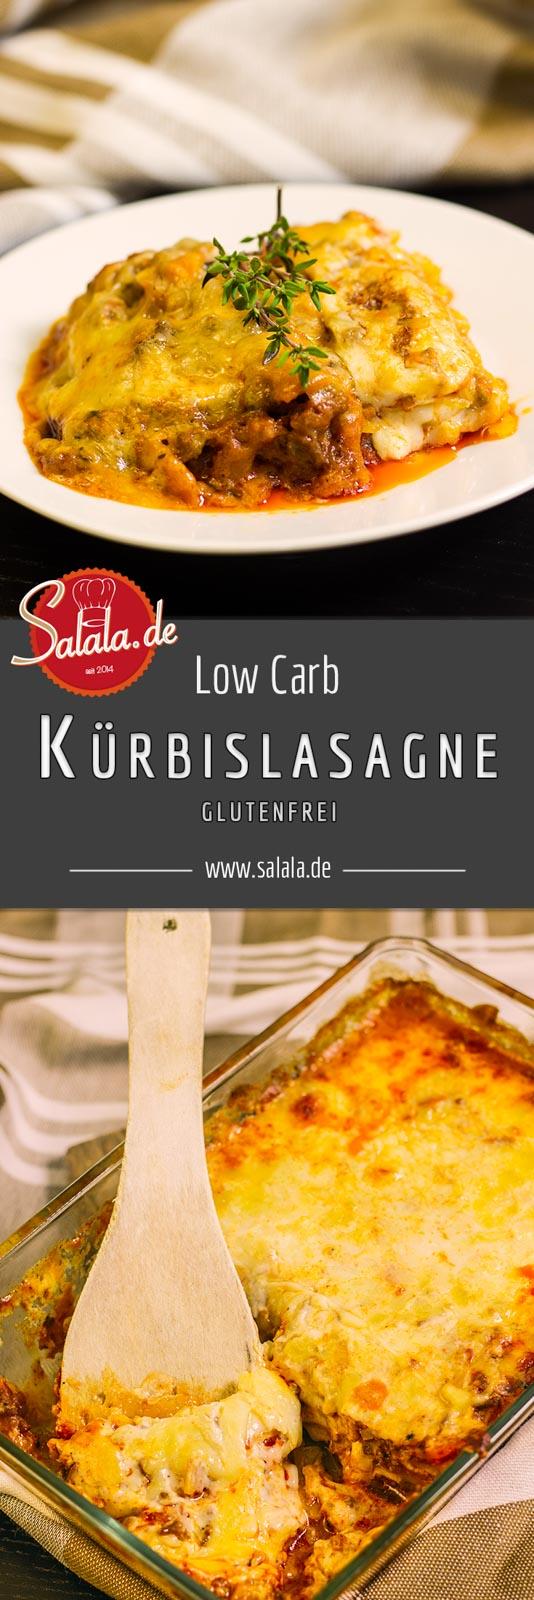 Low Carb Kürbislasagne - by salala.de - mit Low Carb Bechamelsauce Lasagneplatten Kürbis selber machen Hackfleisch Bolognese